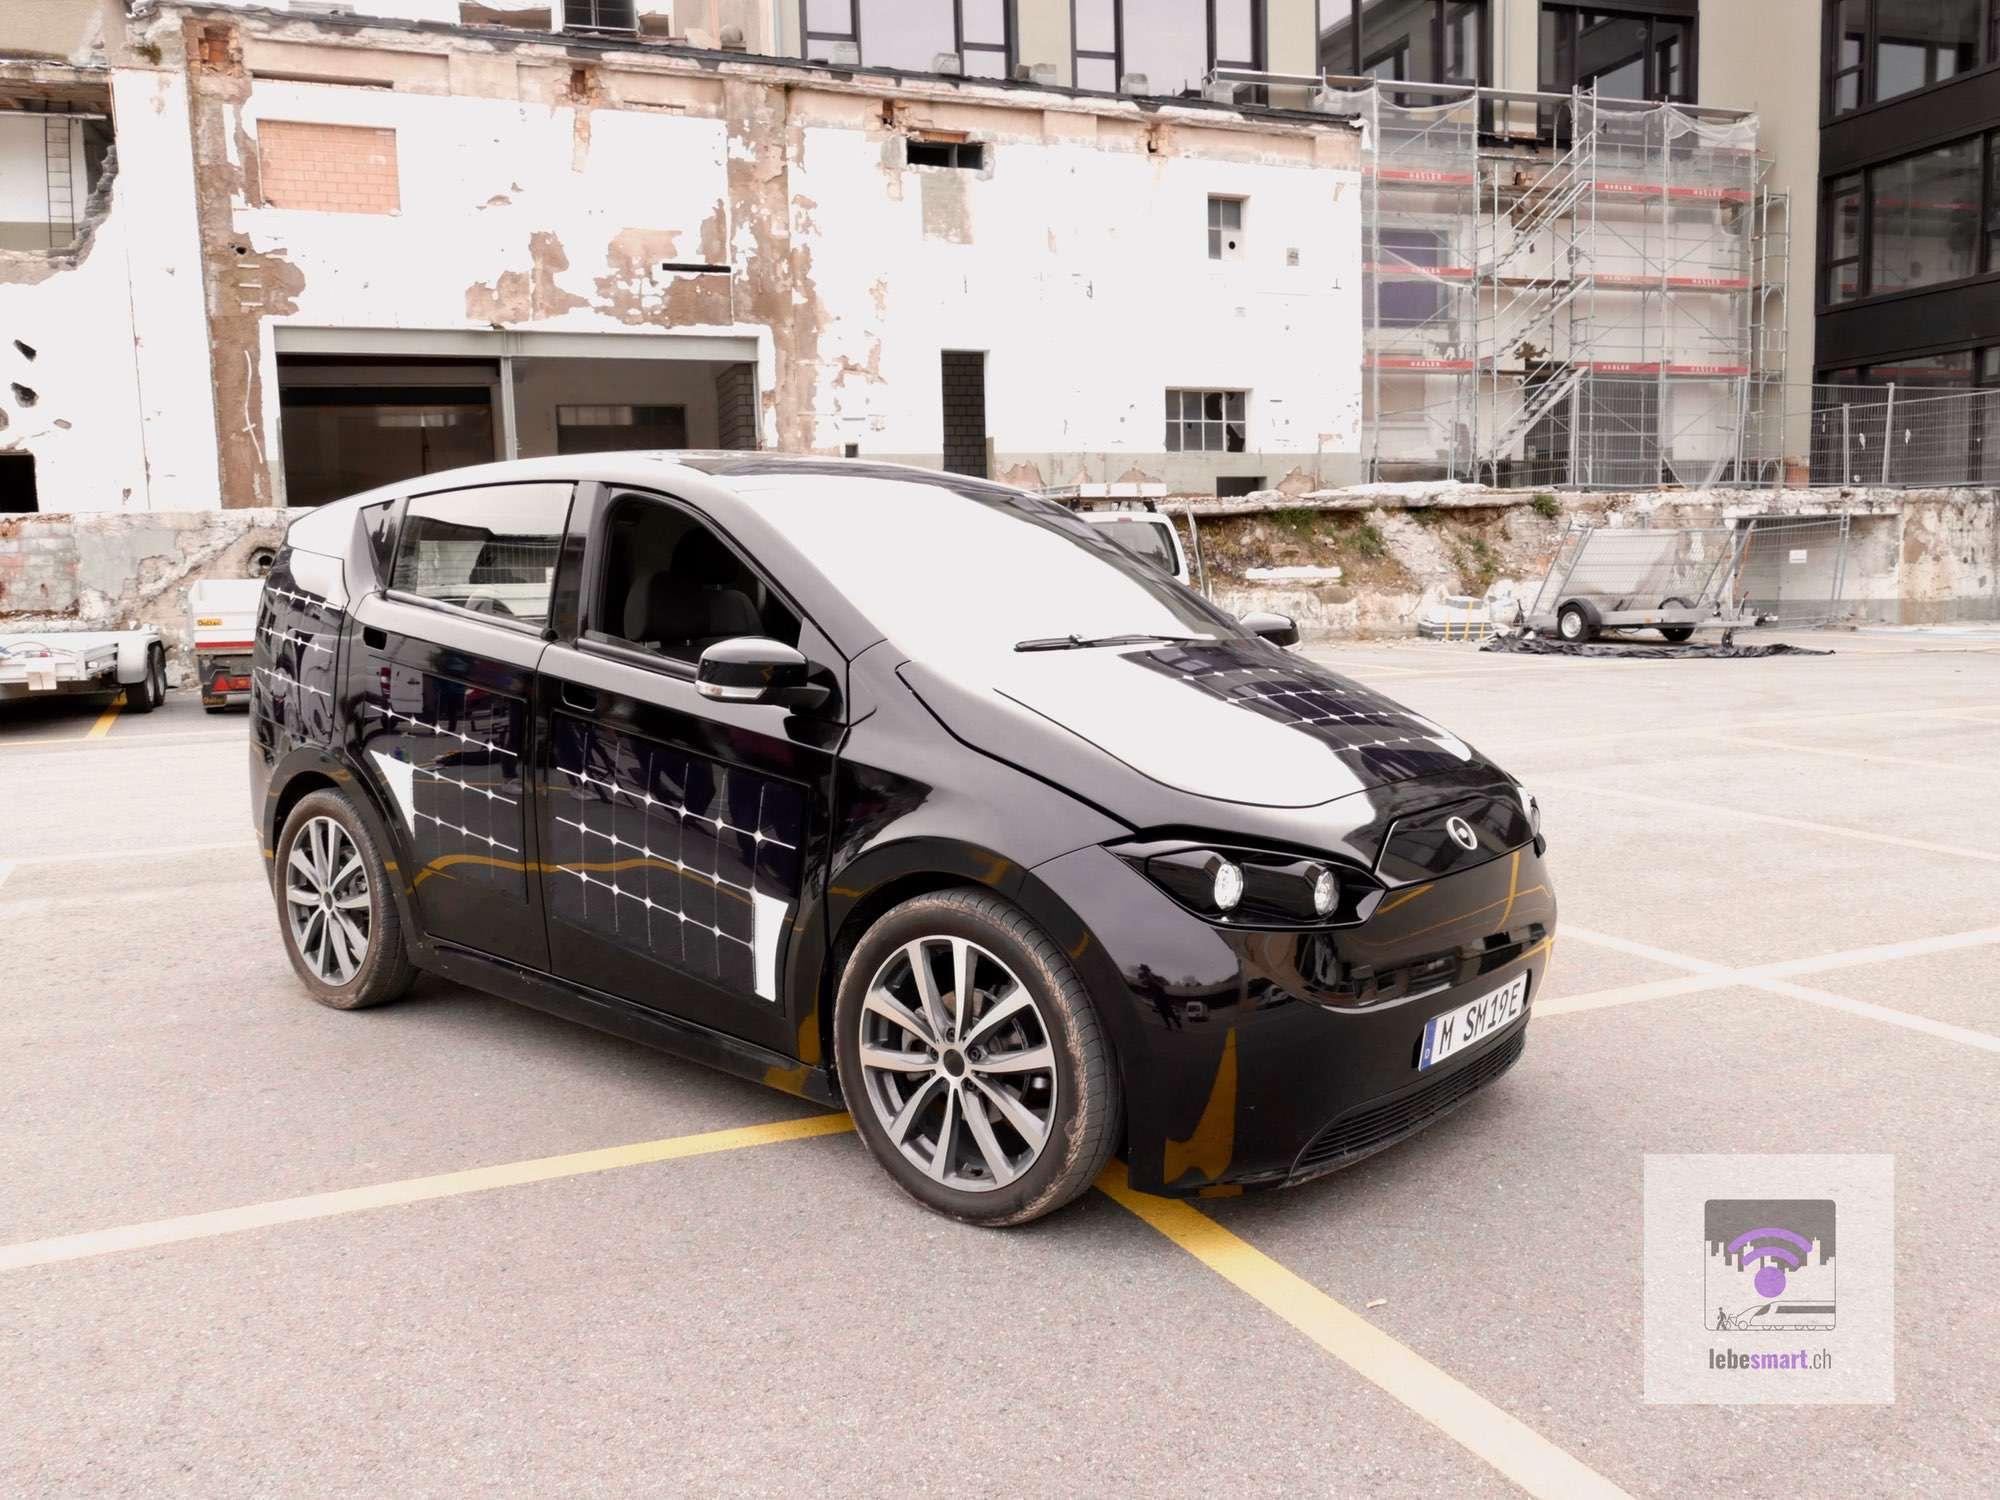 Testfahrt Mit Dem Sion Elektroauto Mit Solarstrom Lebesmart